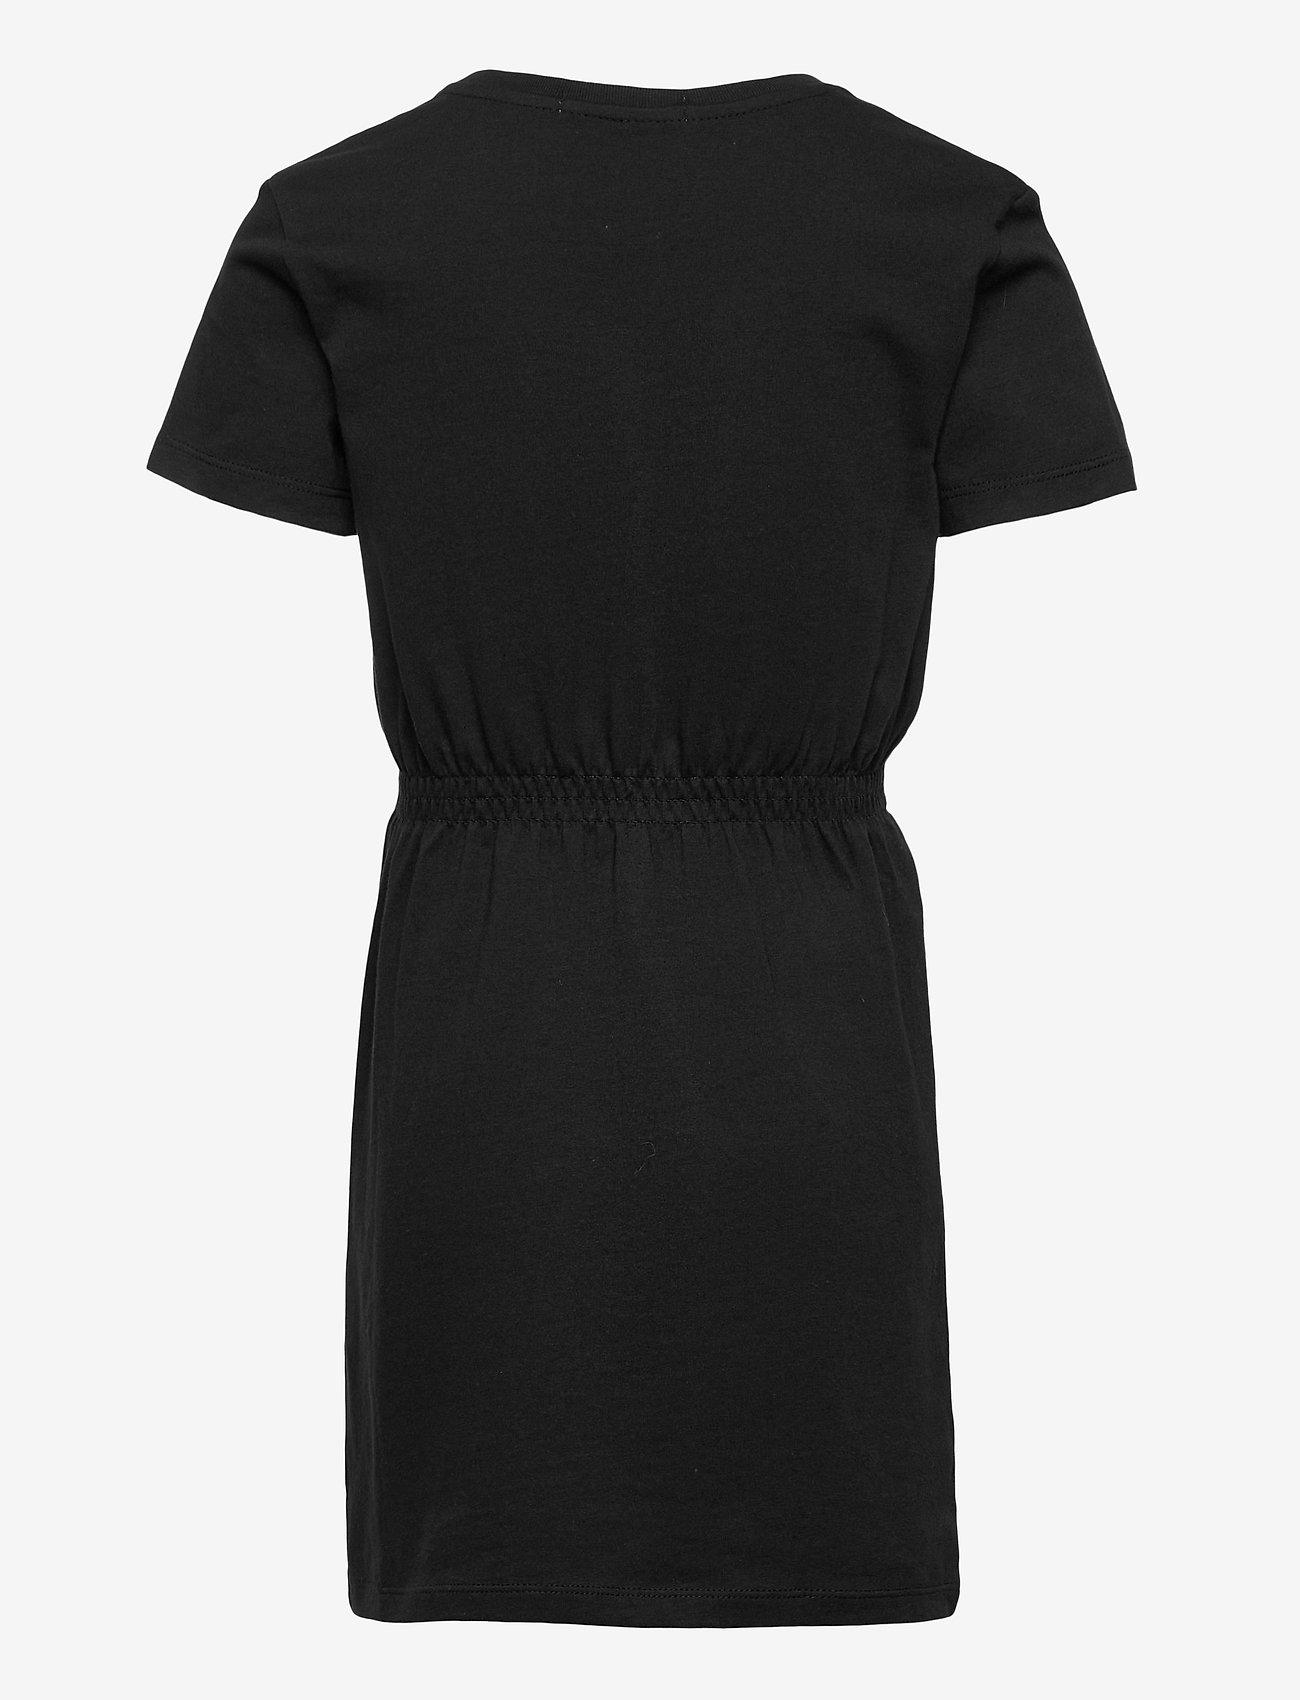 Calvin Klein - HYBRID LOGO T-SHIRT DRESS - kleider - ck black - 1